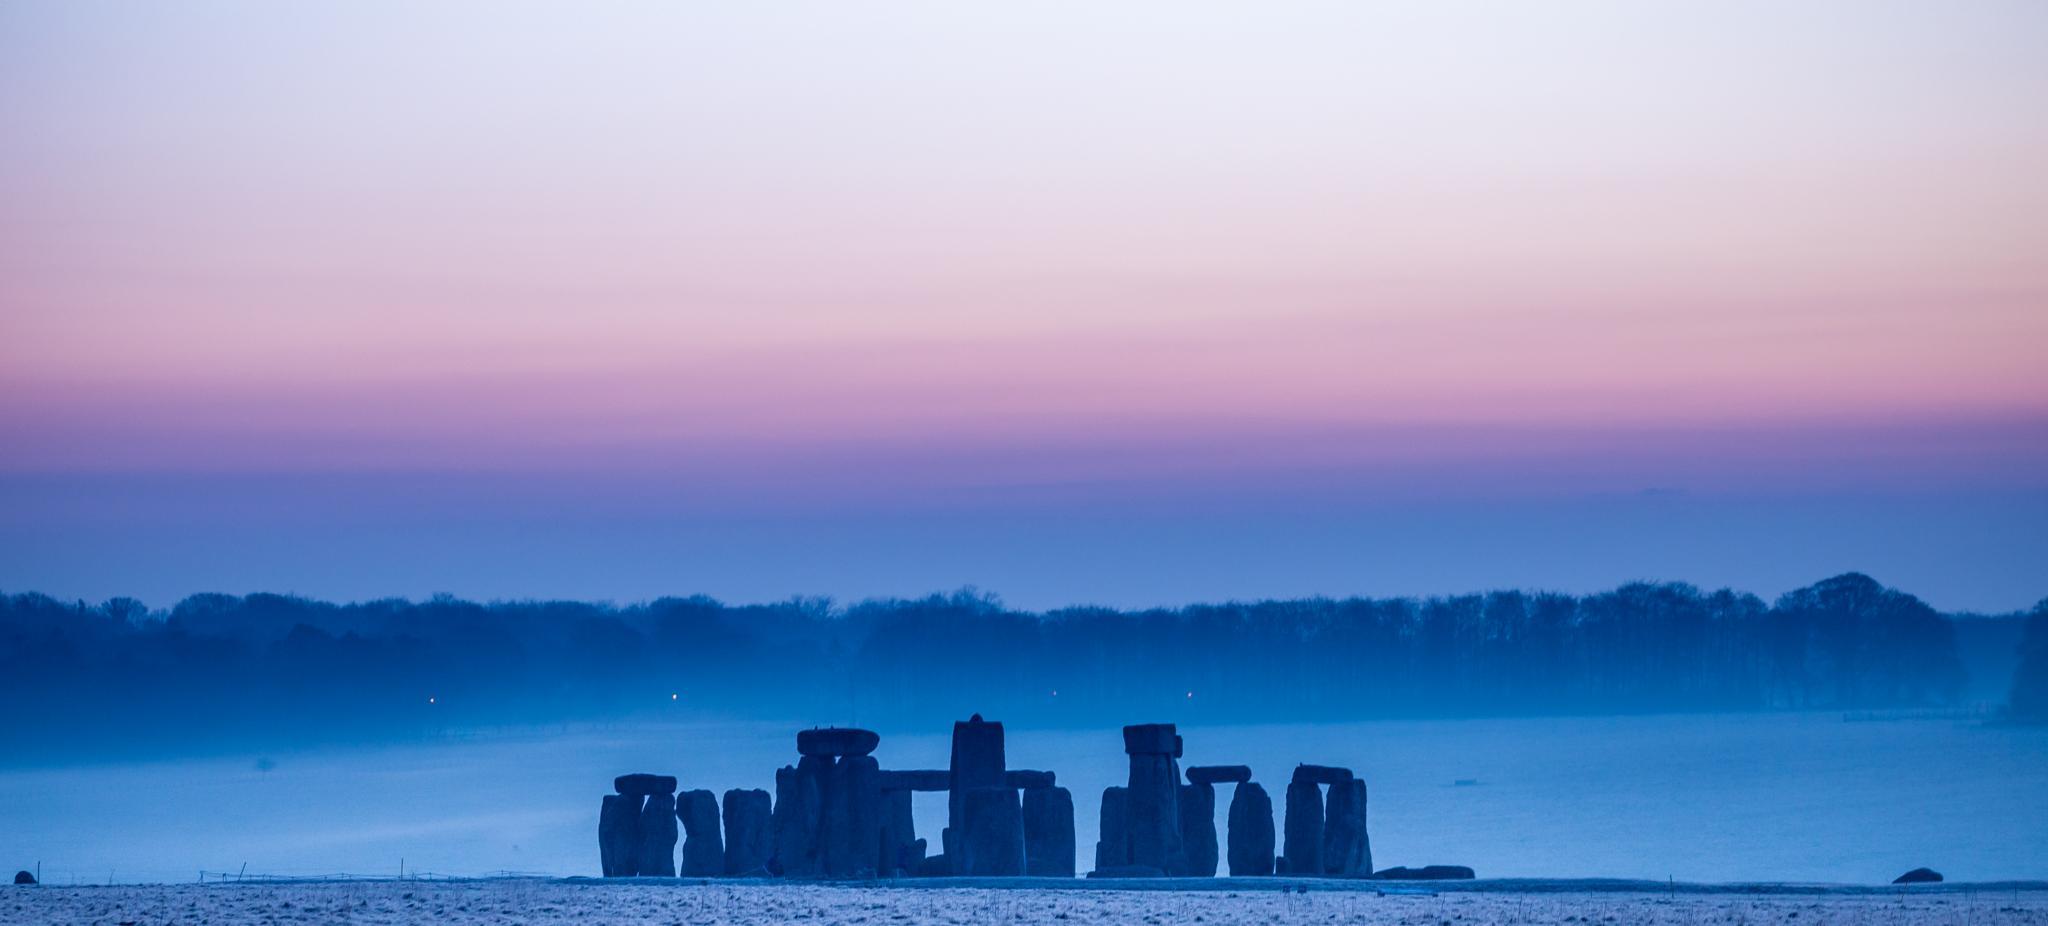 More Stonehenge by messedupmojo